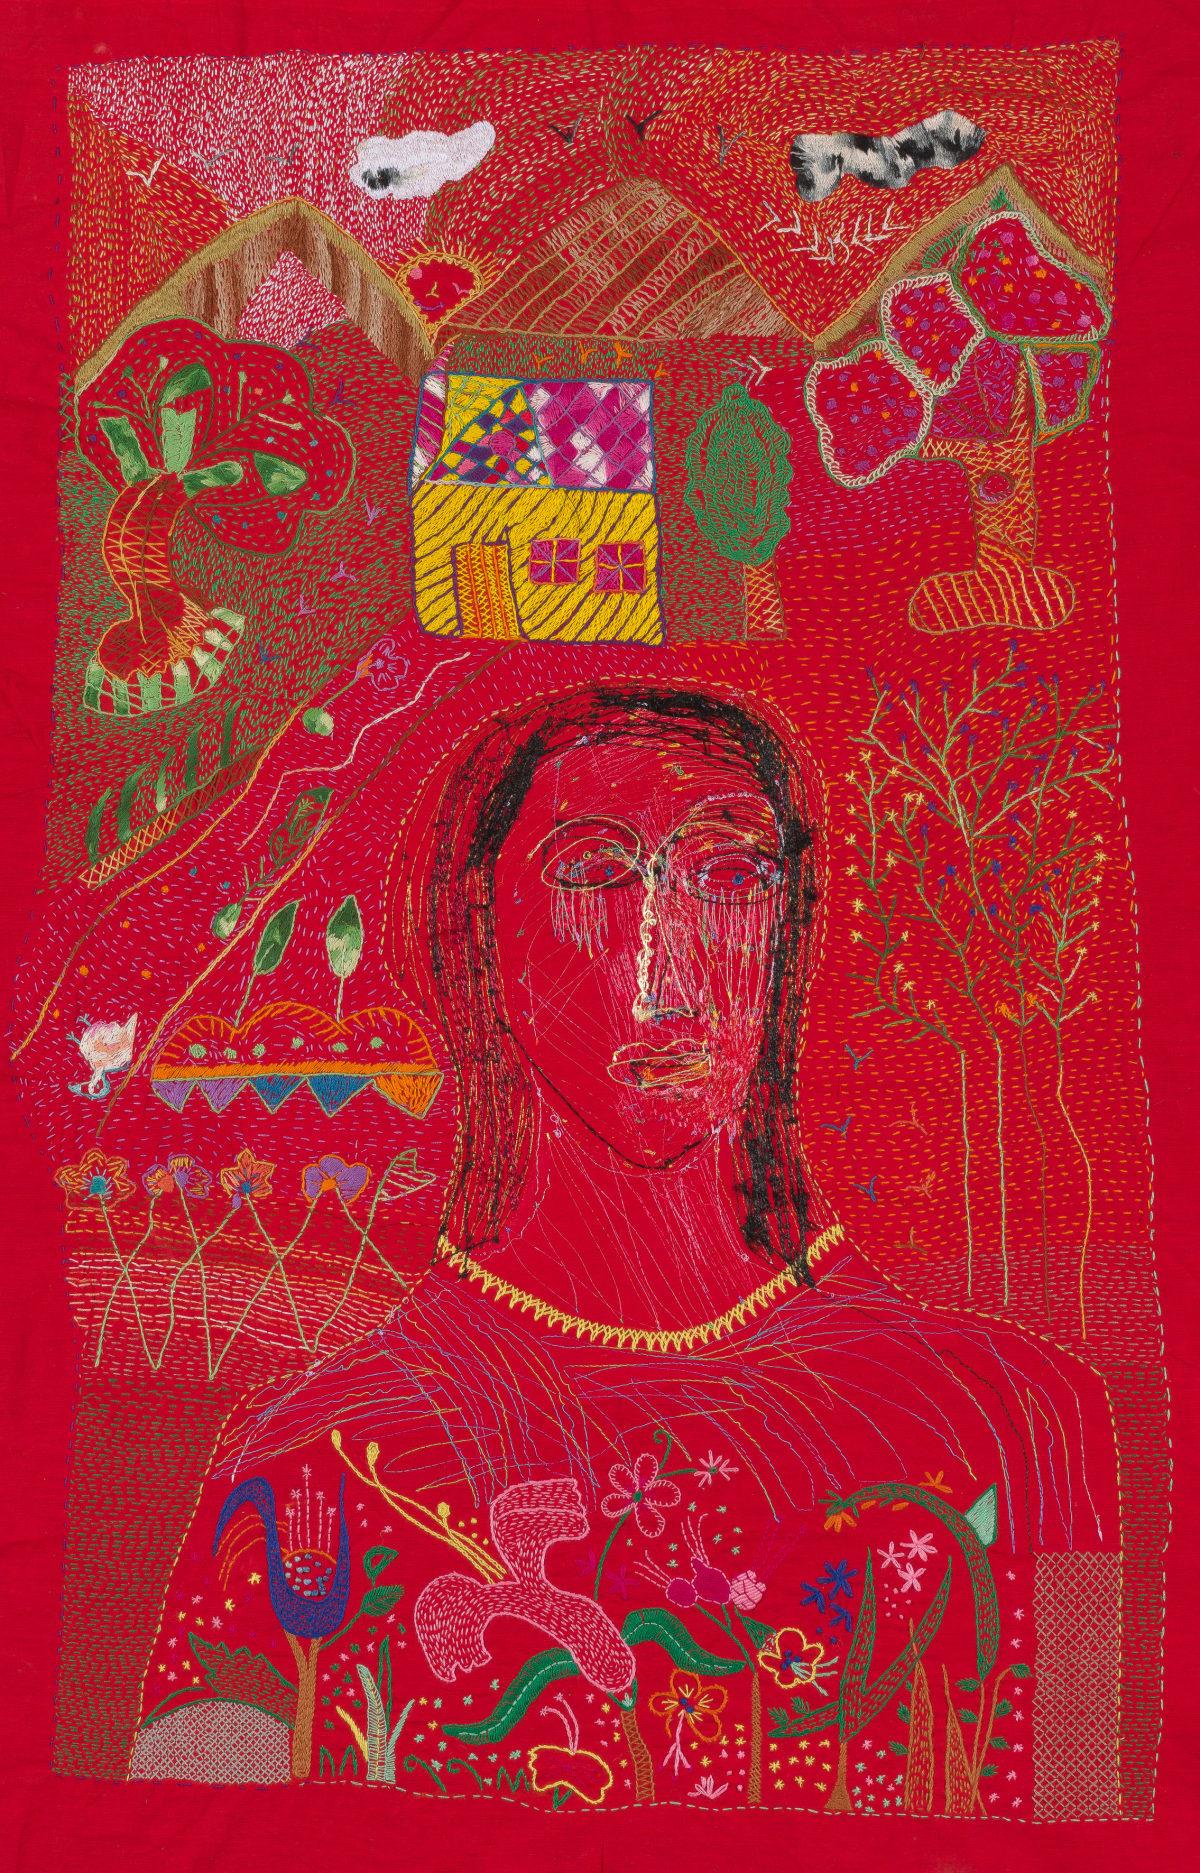 Alice Kettle, Karachi Woman II, 2019